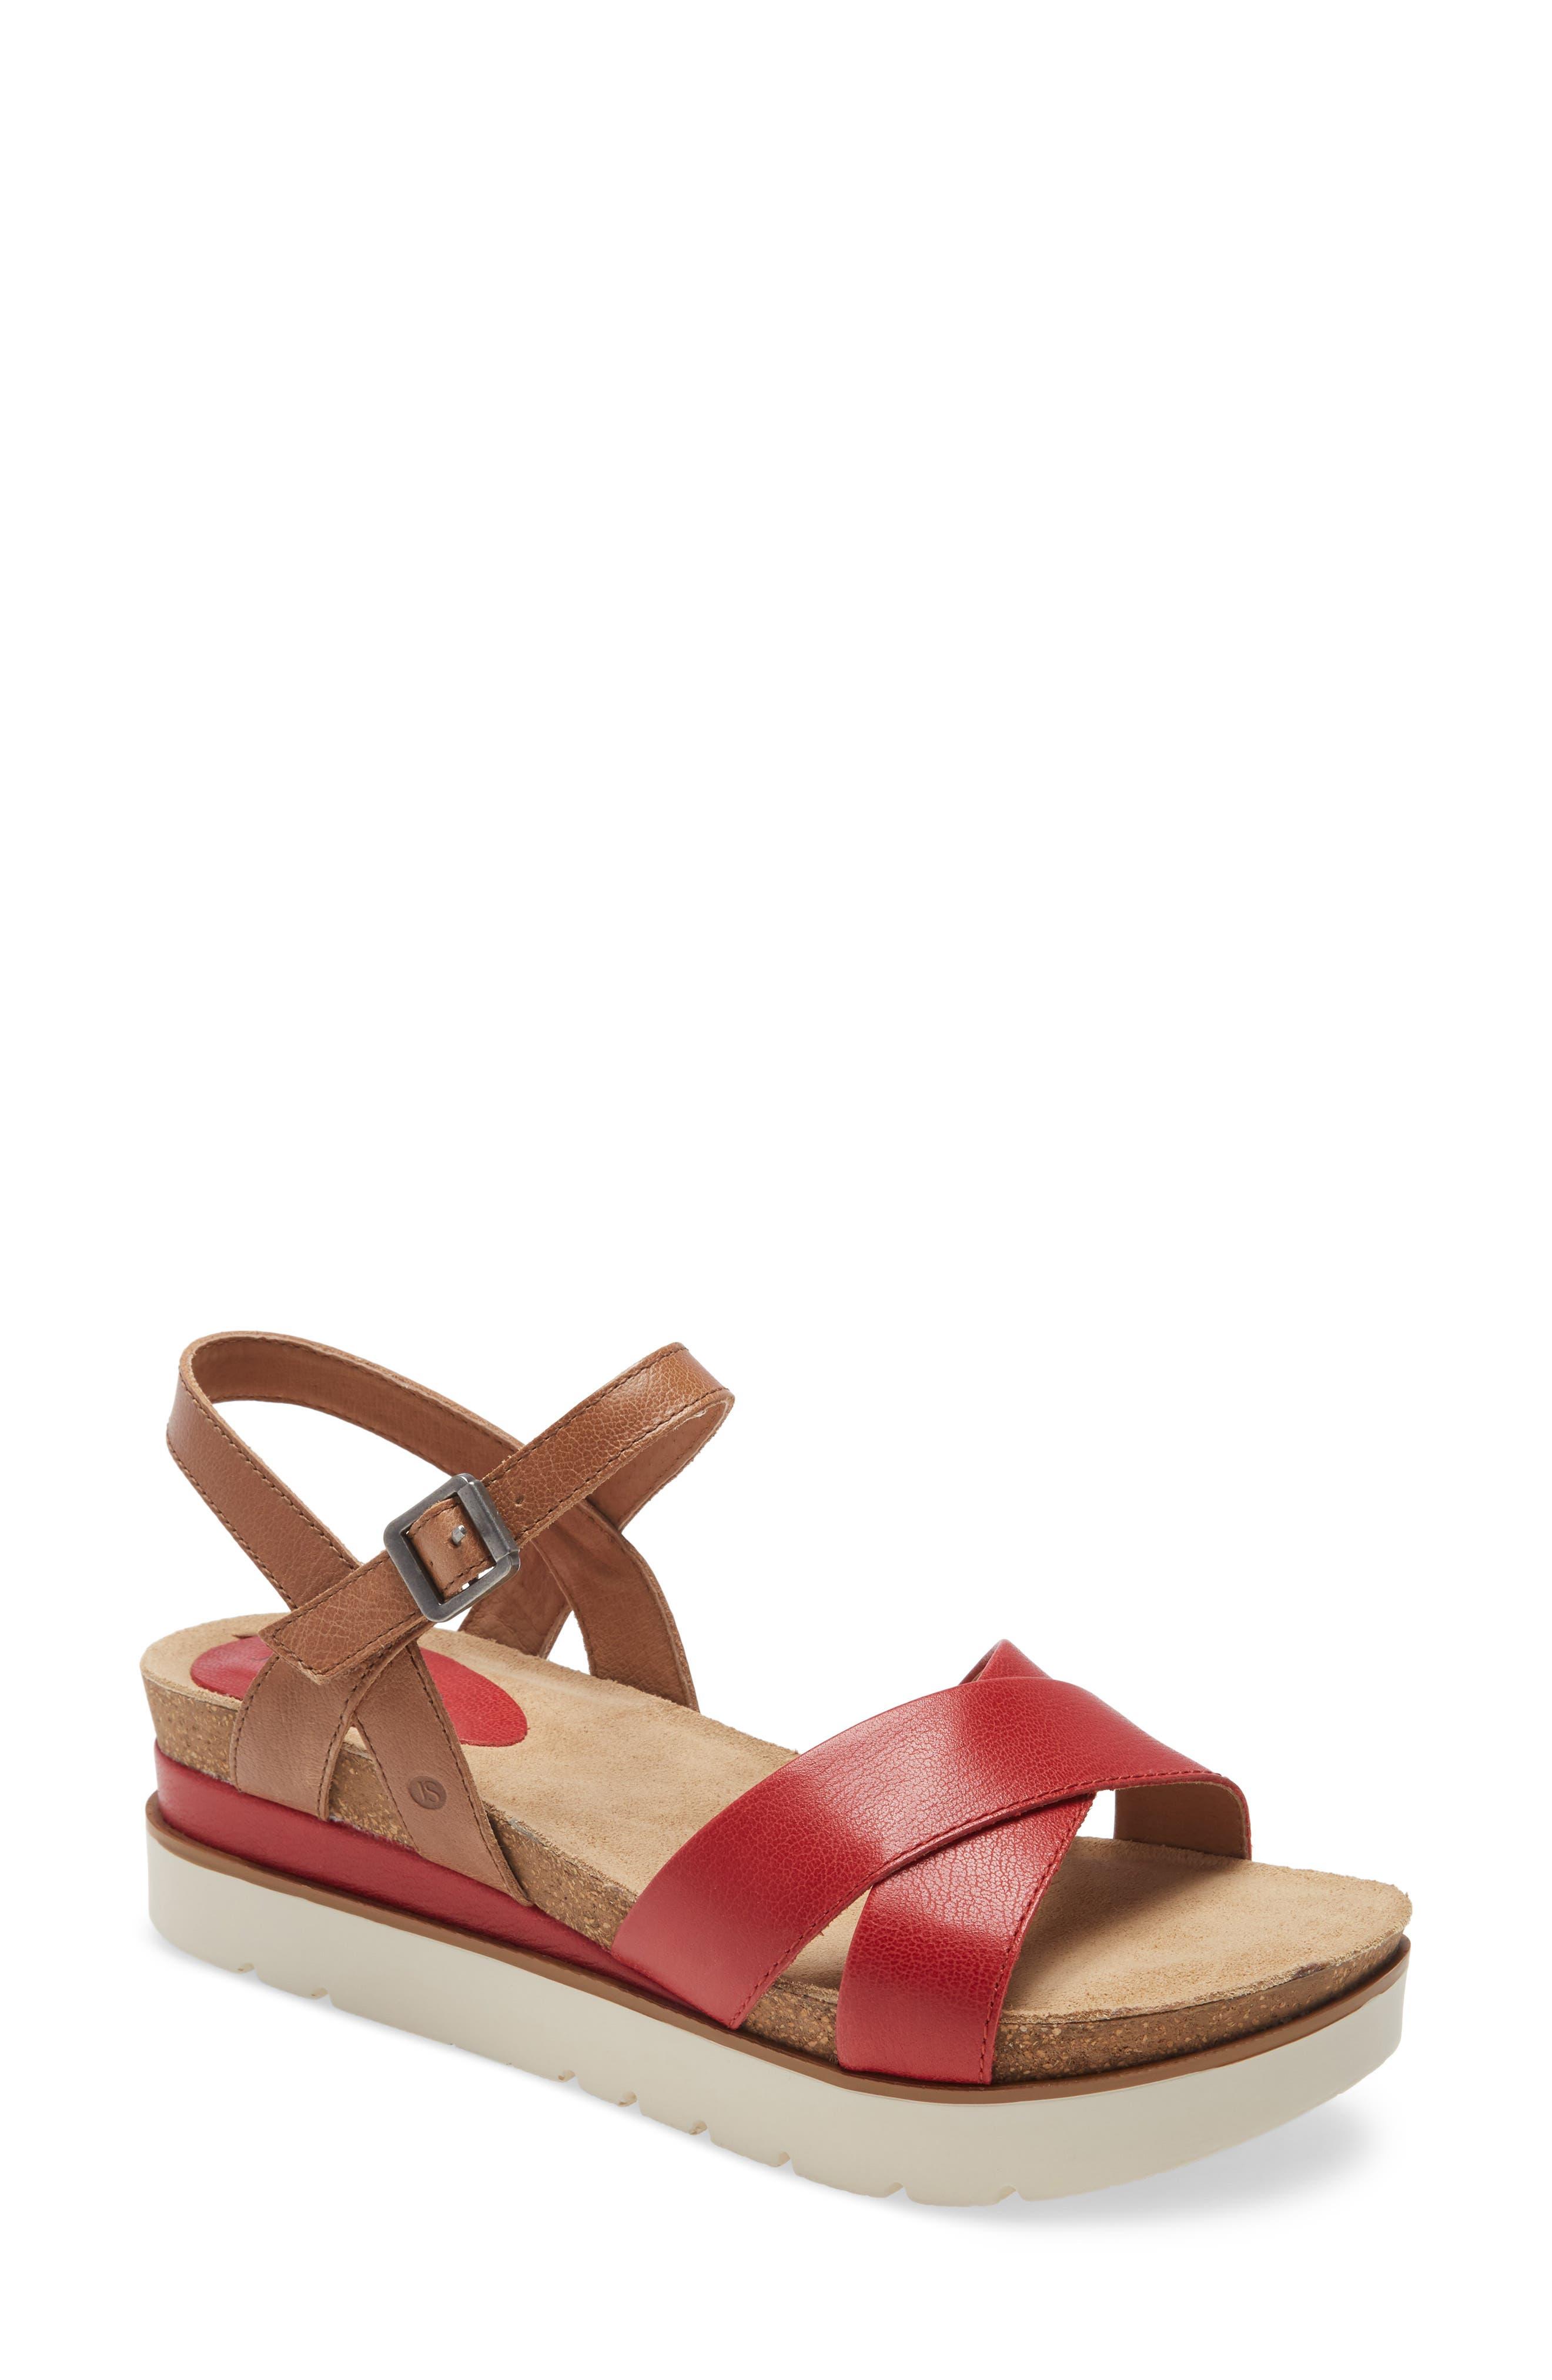 Clea 10 Platform Sandal